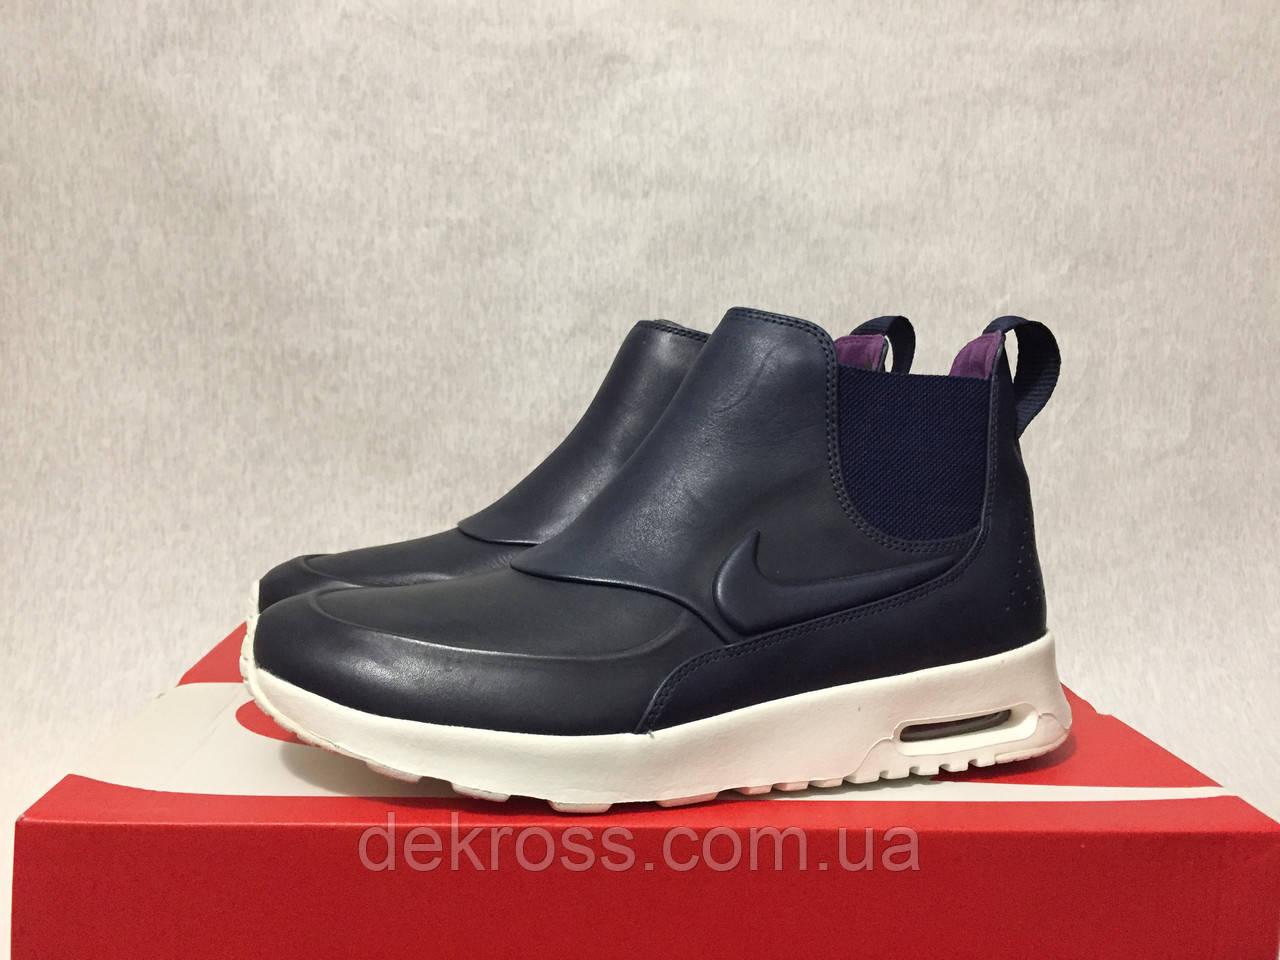 separation shoes c1942 338bb ... new zealand nike air max thea mid 859550 400 11e9e c63e6